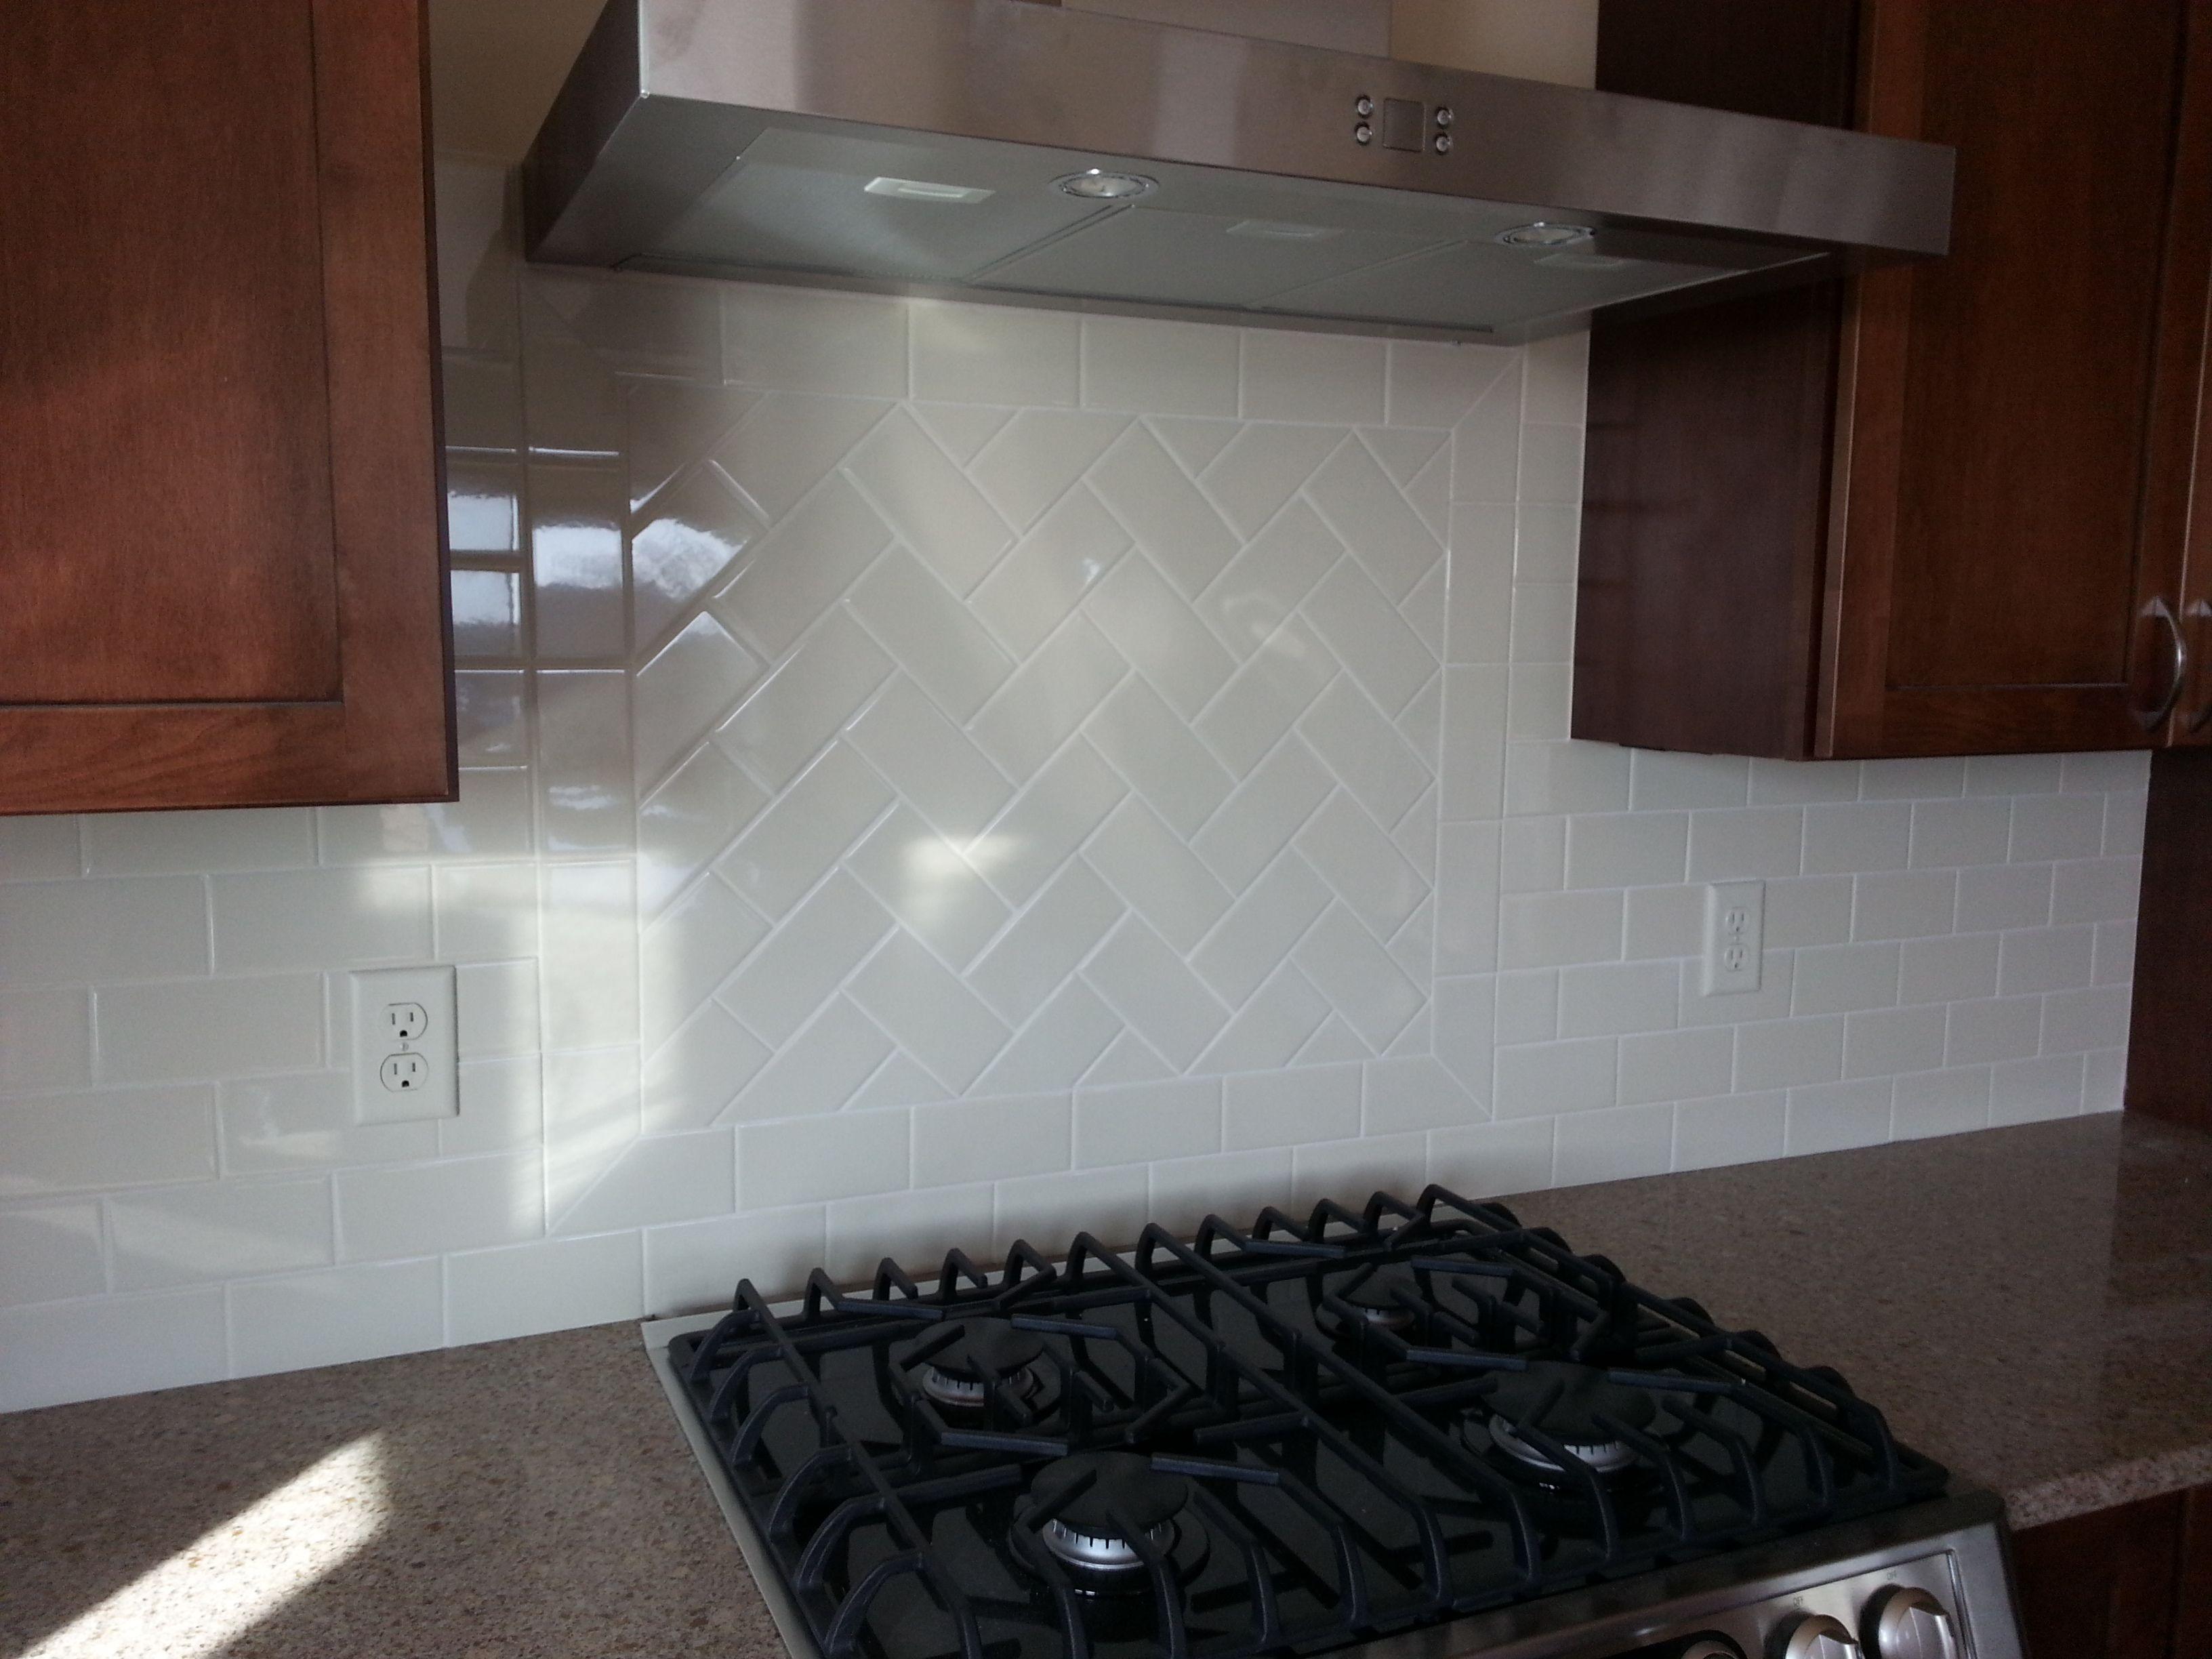 kitchen backsplash patterns 30 sink gerard homes traditional 3x6 subway tile with